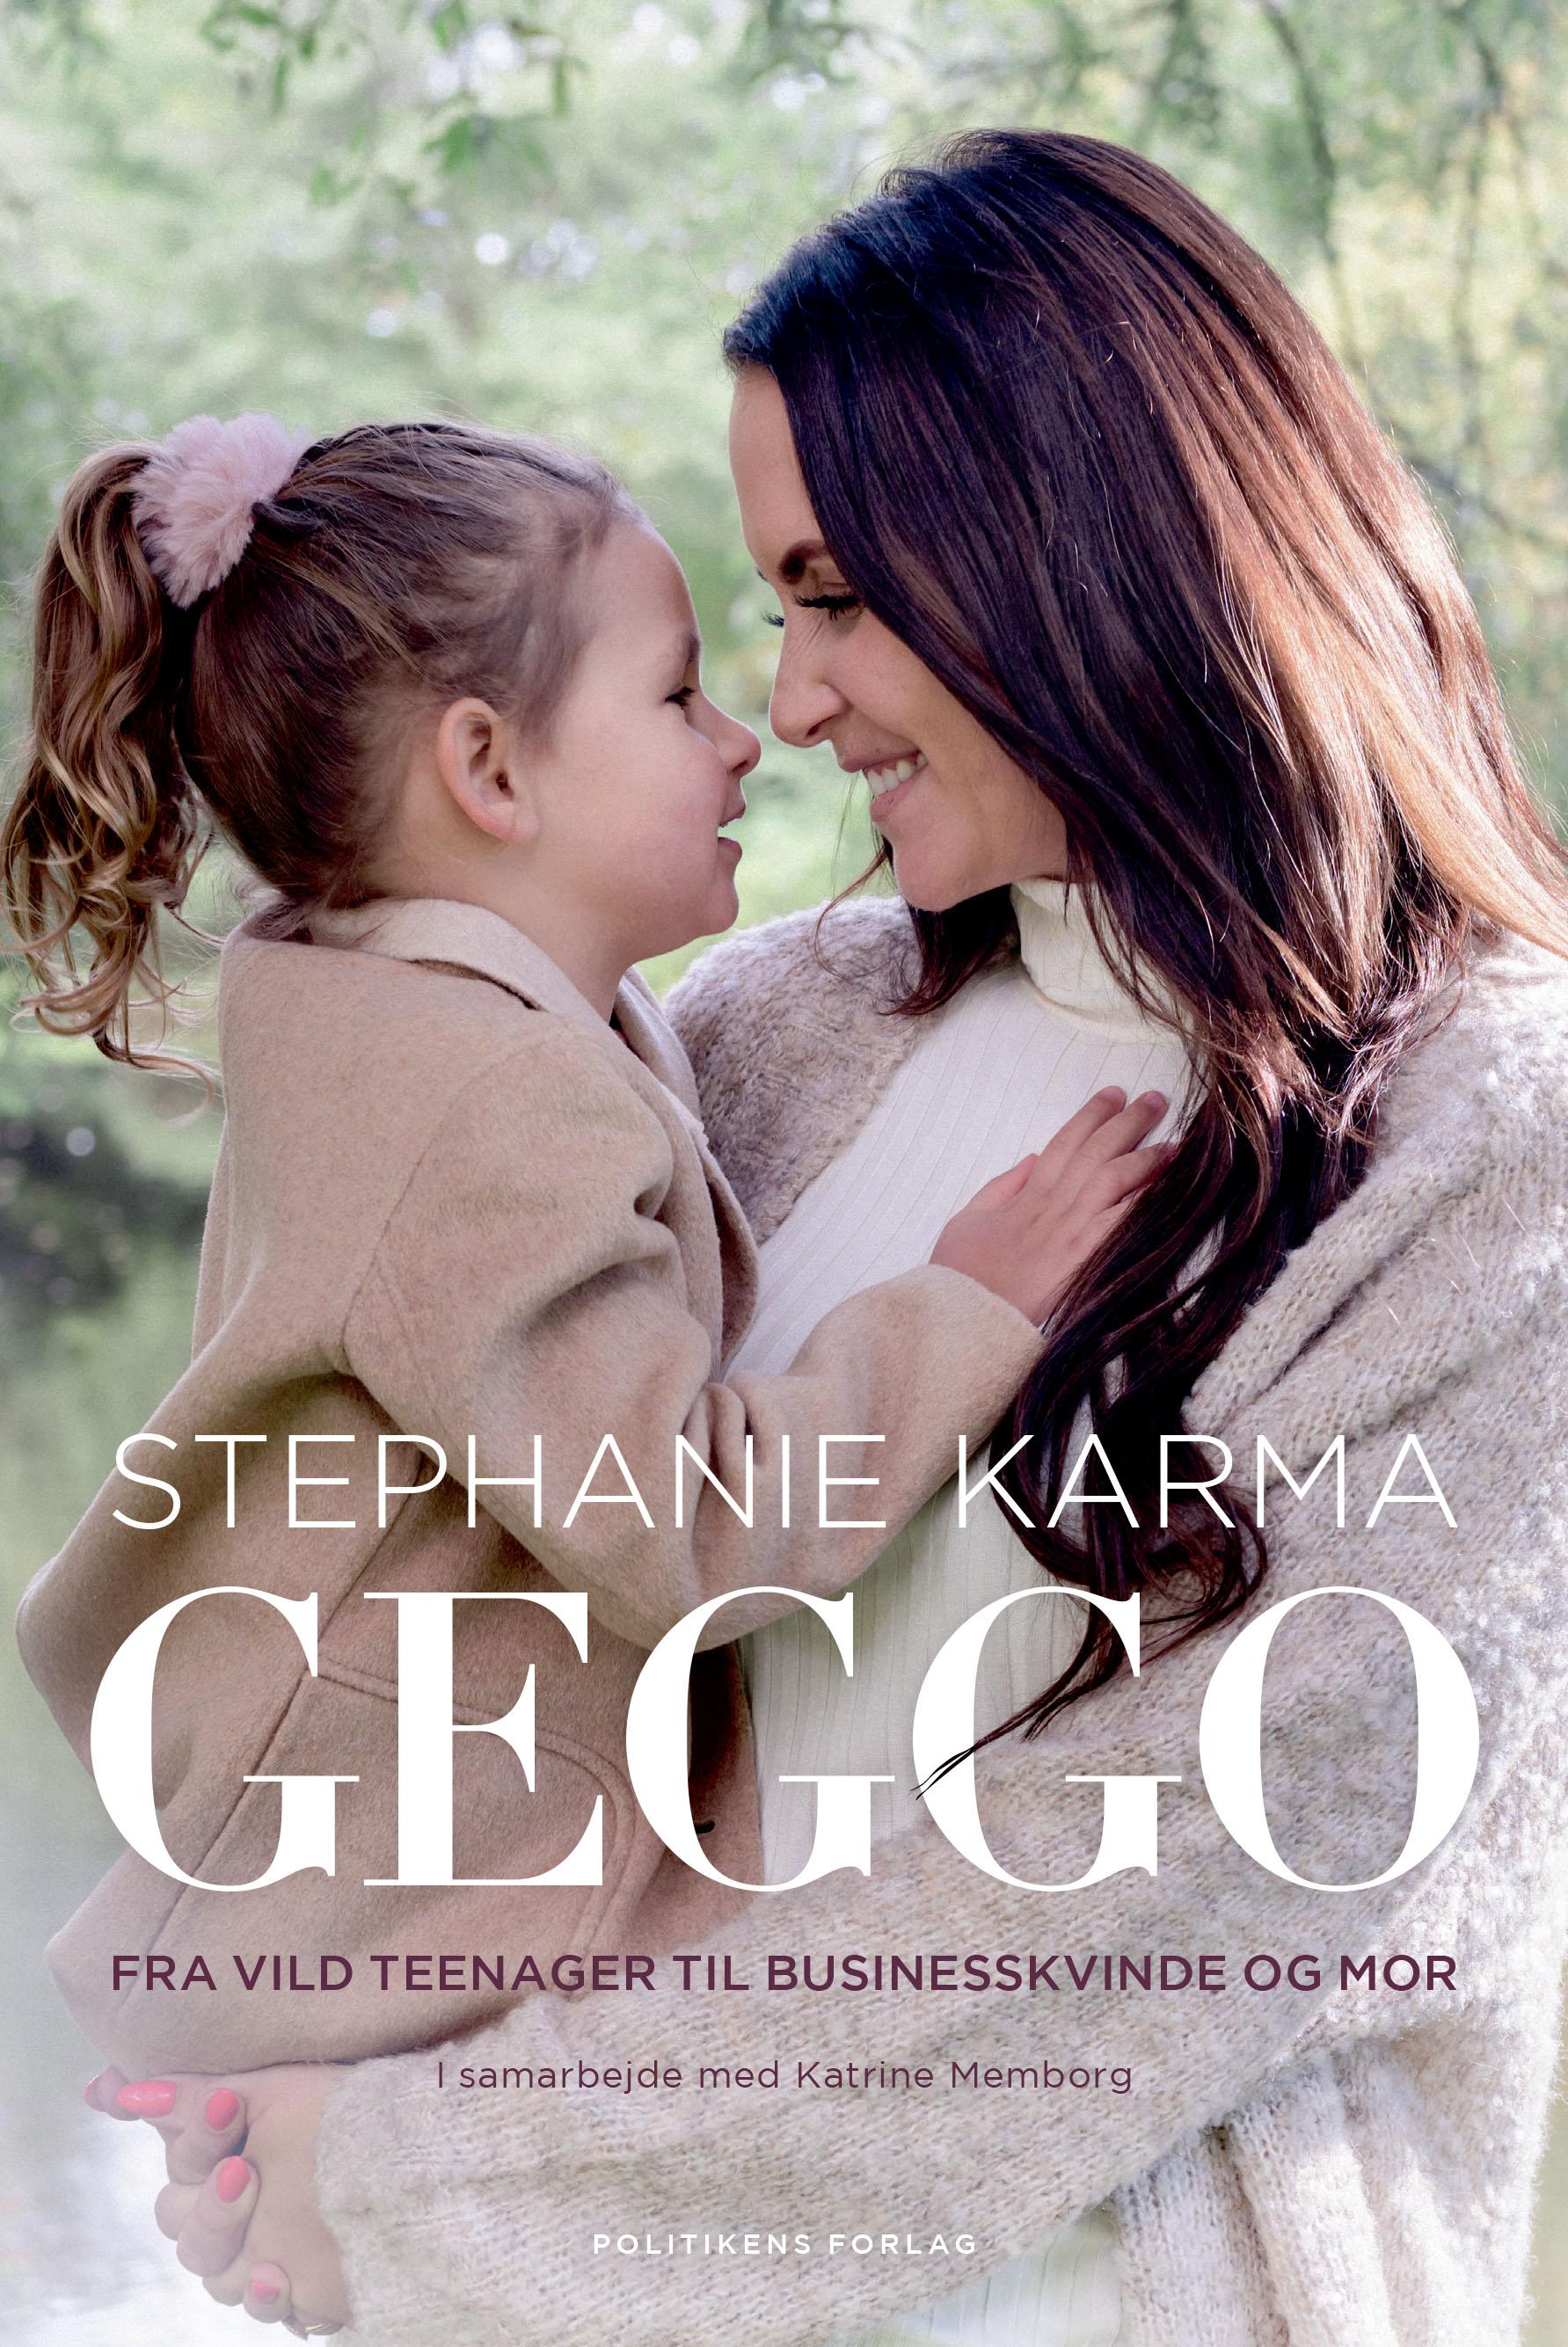 Geggo - Katrine Memborg; Stephanie Karma Salvarli - Bøger - Politikens Forlag - 9788740056914 - May 6, 2020